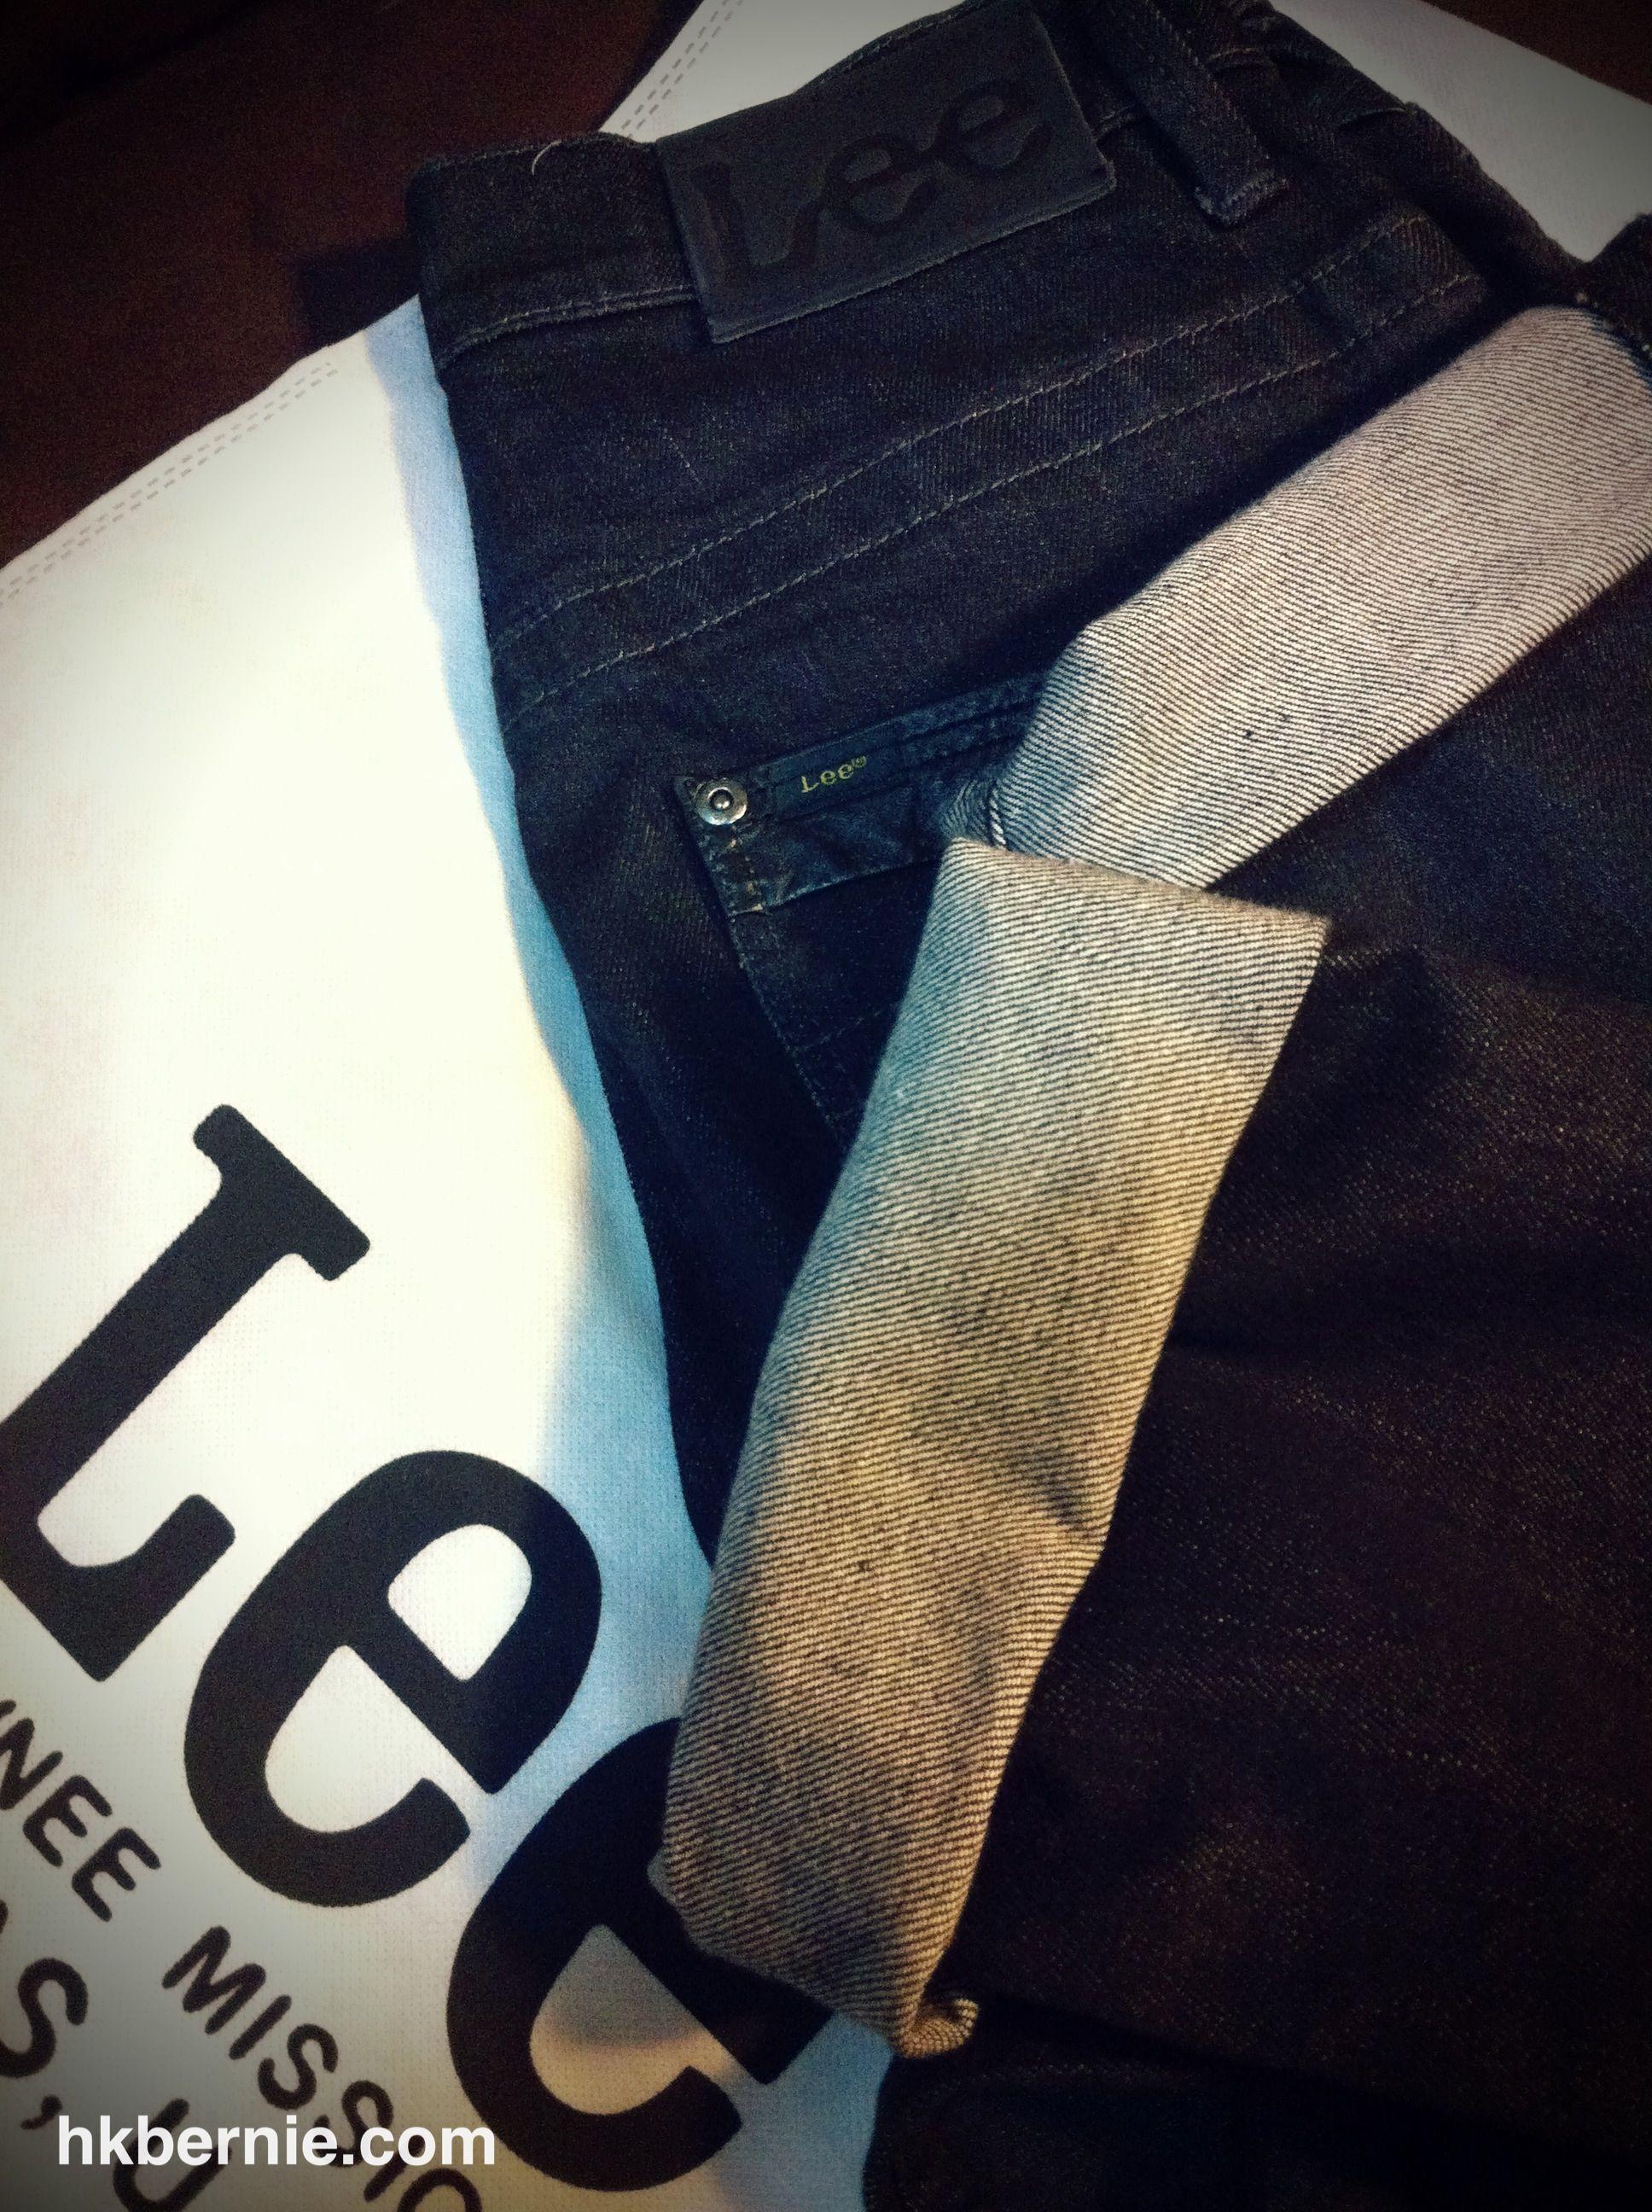 Lee Jeans 銅鑼灣玩味十足藝術旗艦店 | Lee jeans, Blog, Lifestyle blog